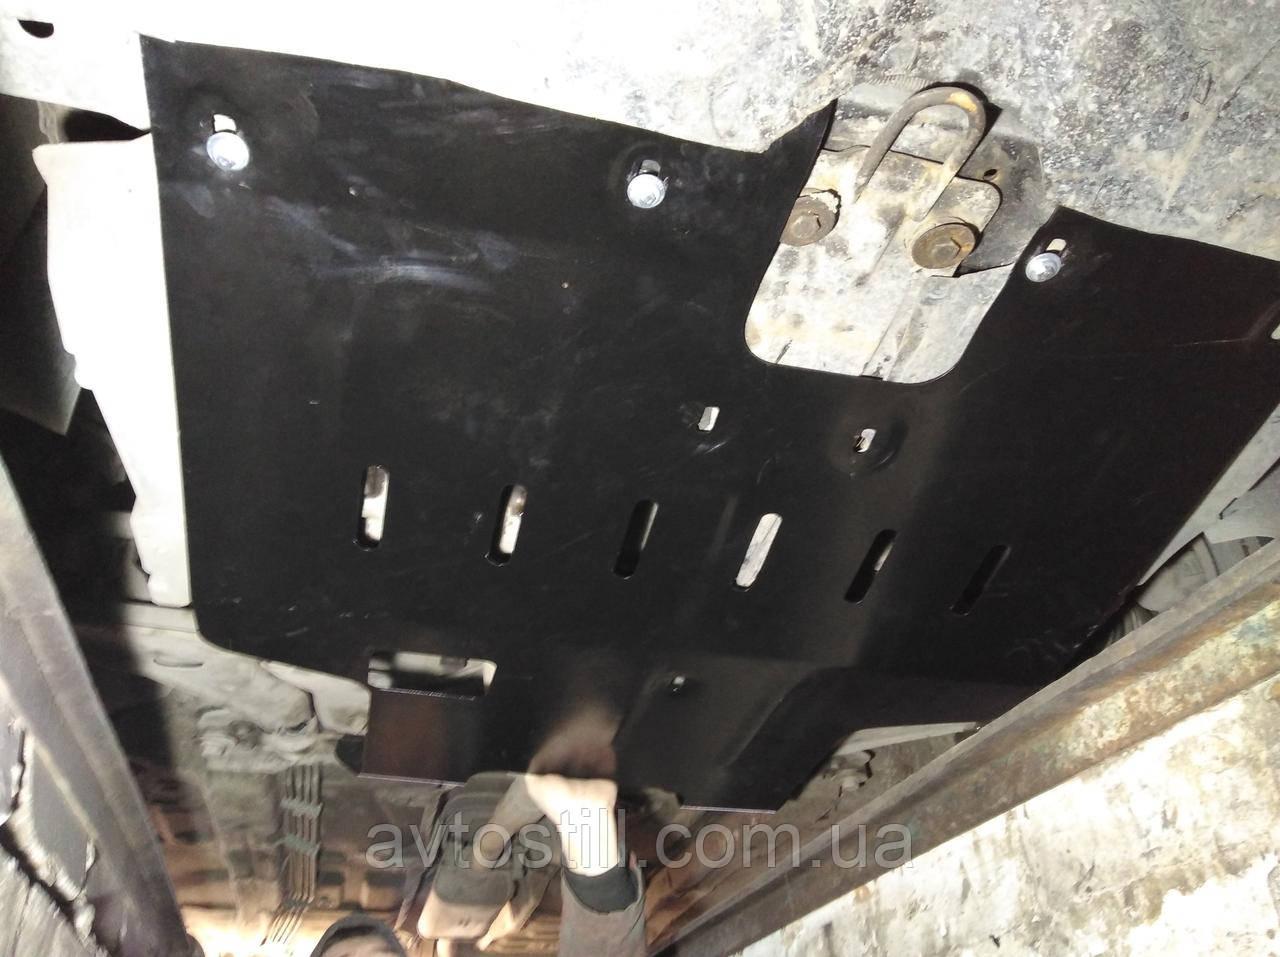 Защита картера двигателя Chery (прайс)